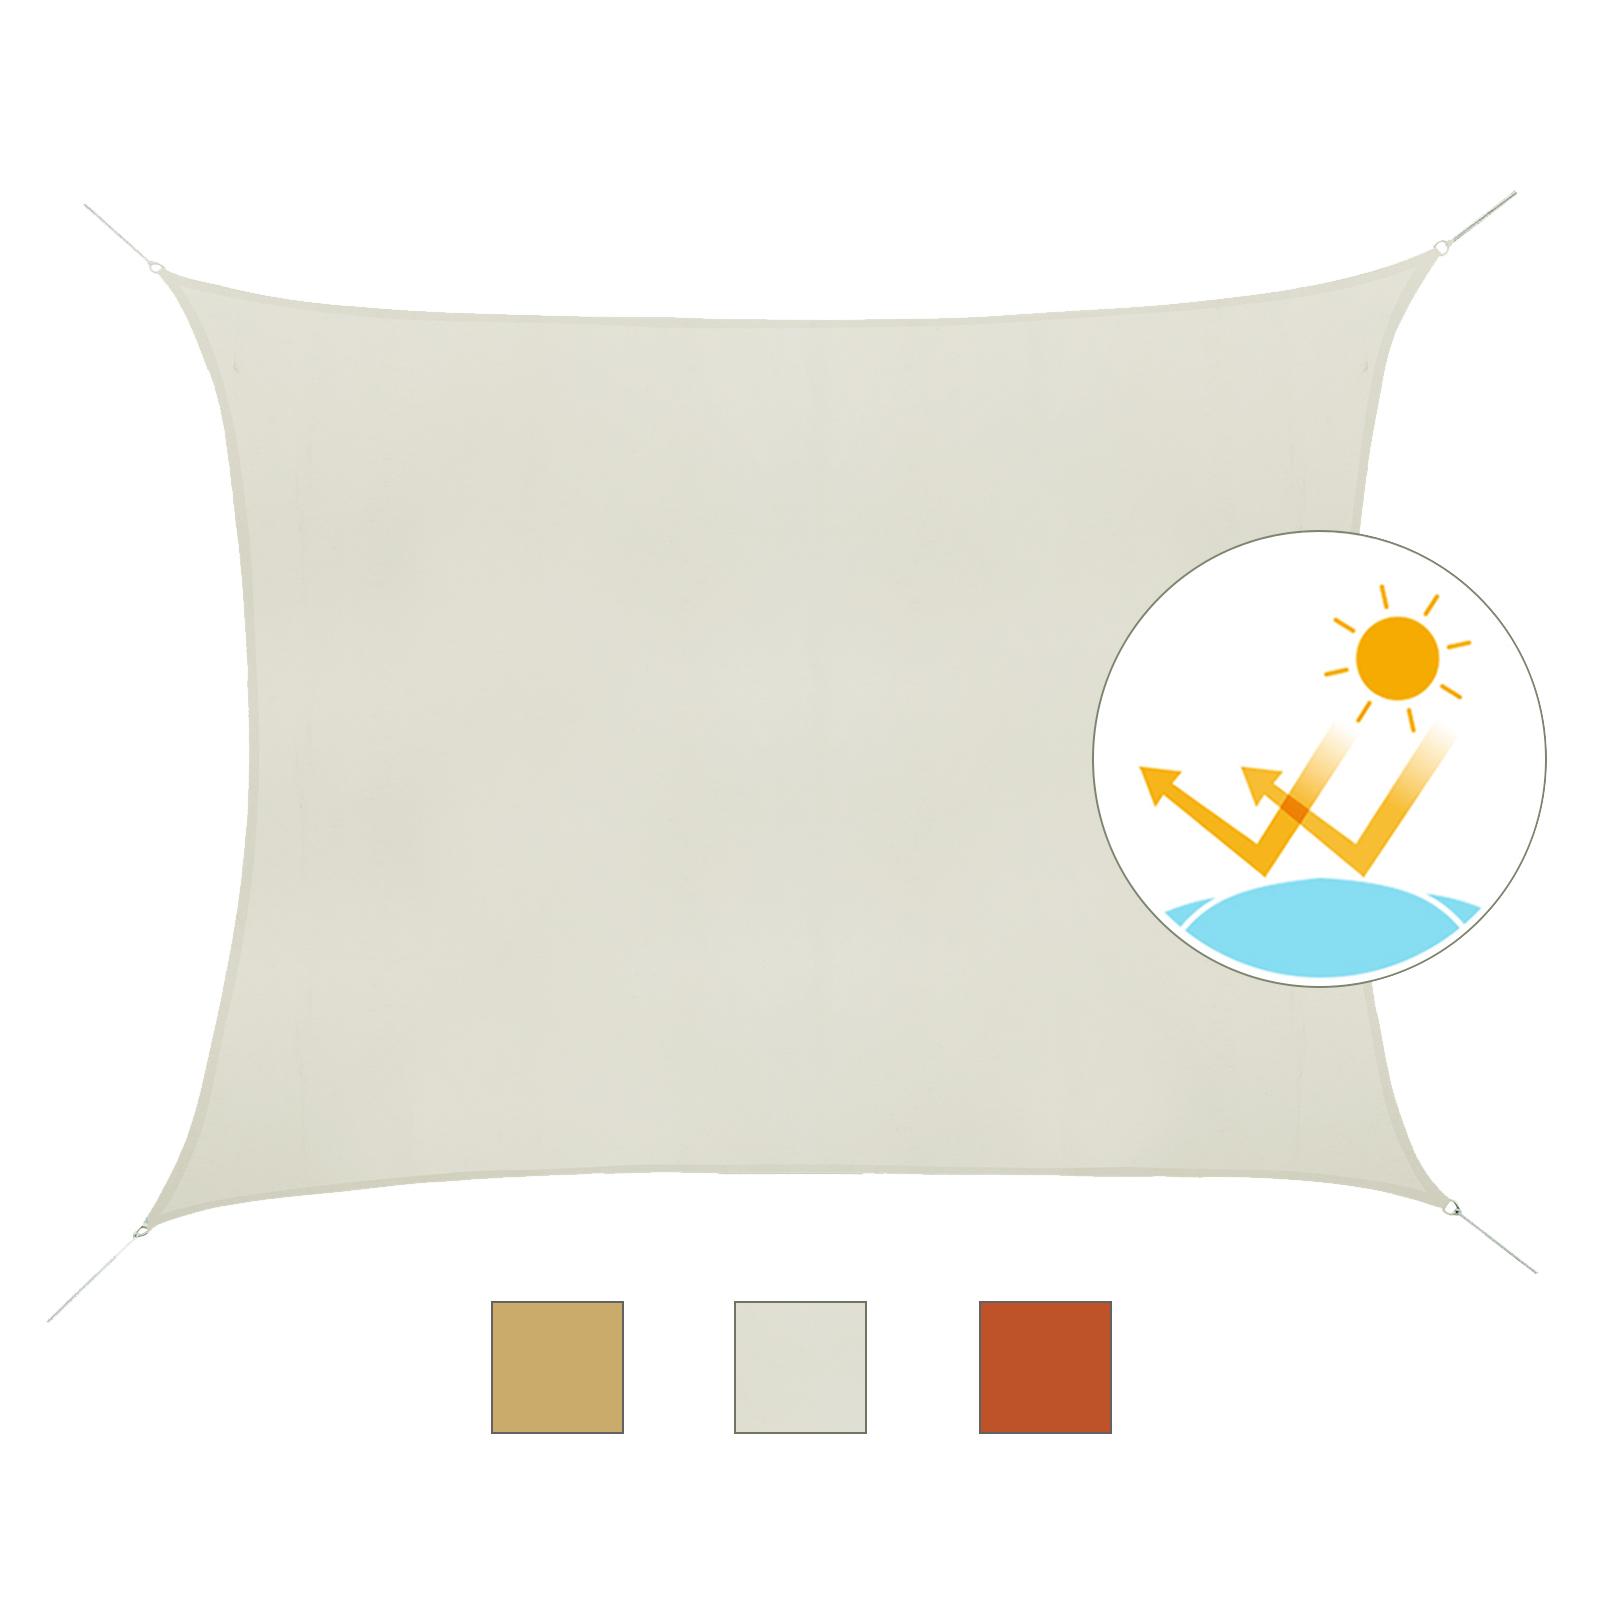 Toldo-de-Vela-Rectangular-para-Jardin-y-Exterior-Repelente-al-Agua-Proteccion-UV miniatura 13